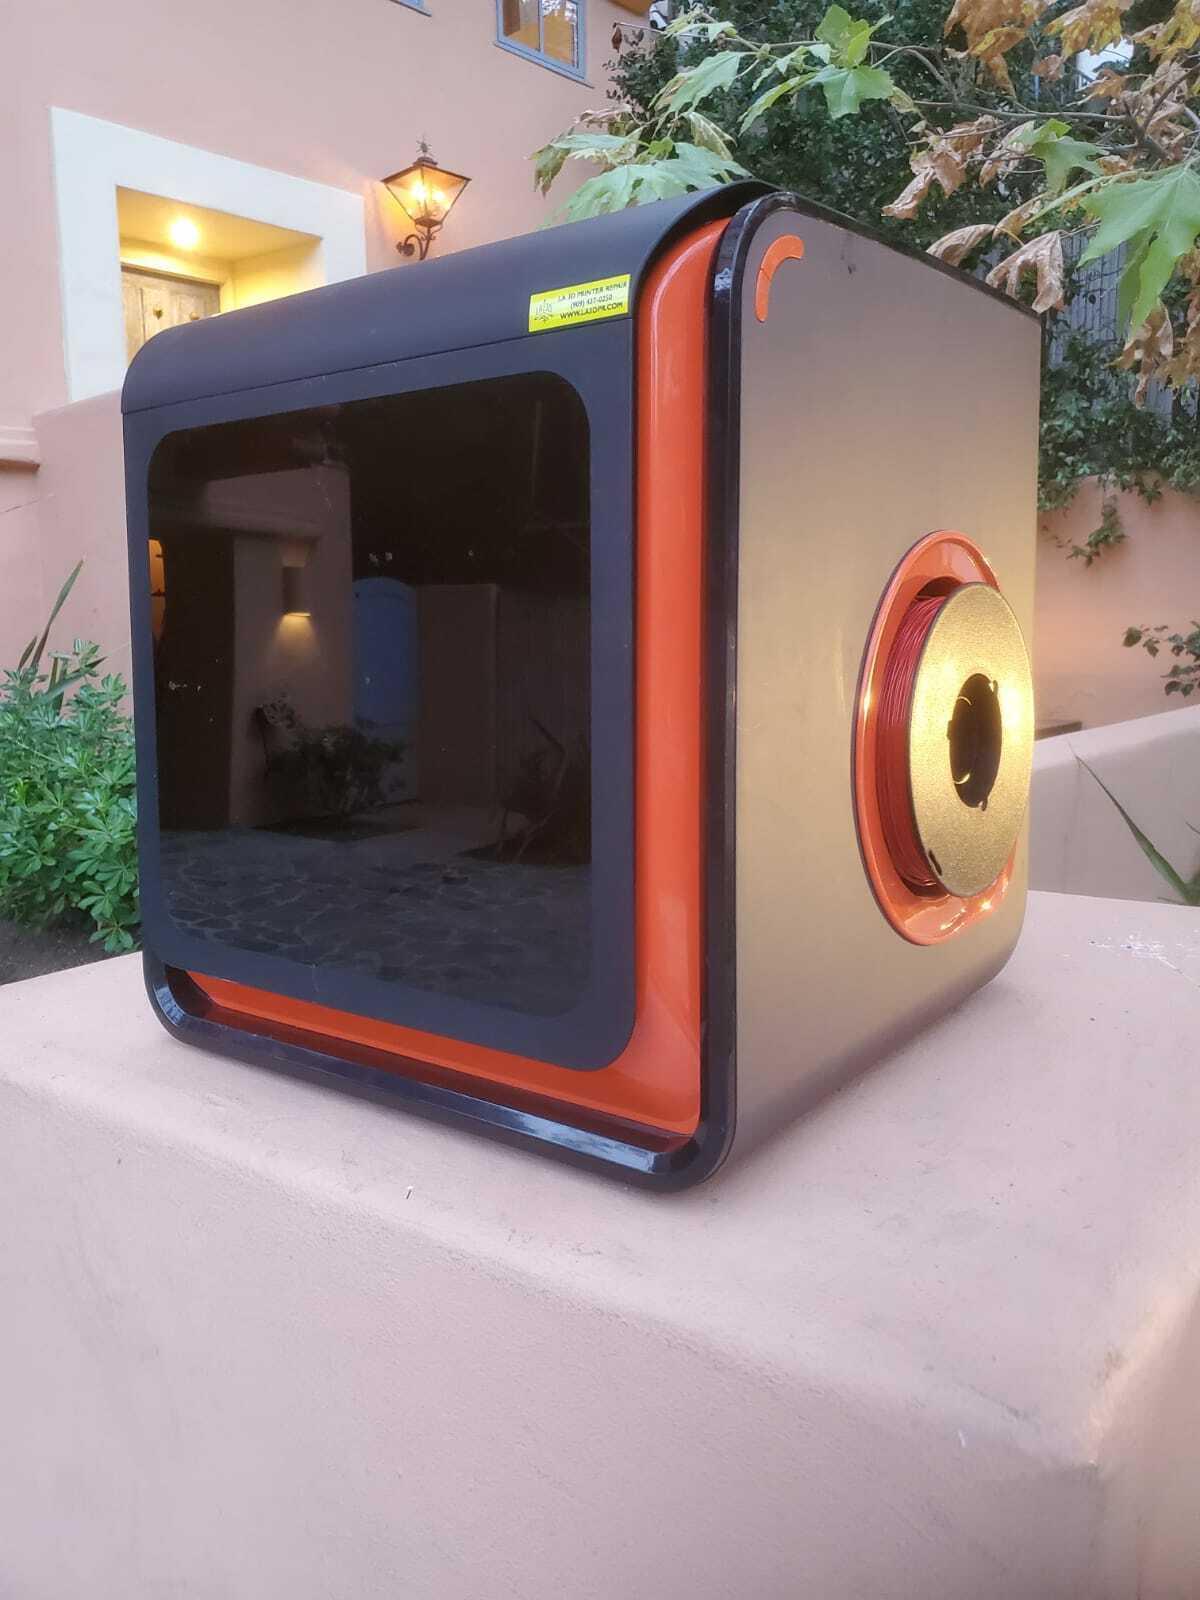 3D Printer: Tiertime Upbox+, USED